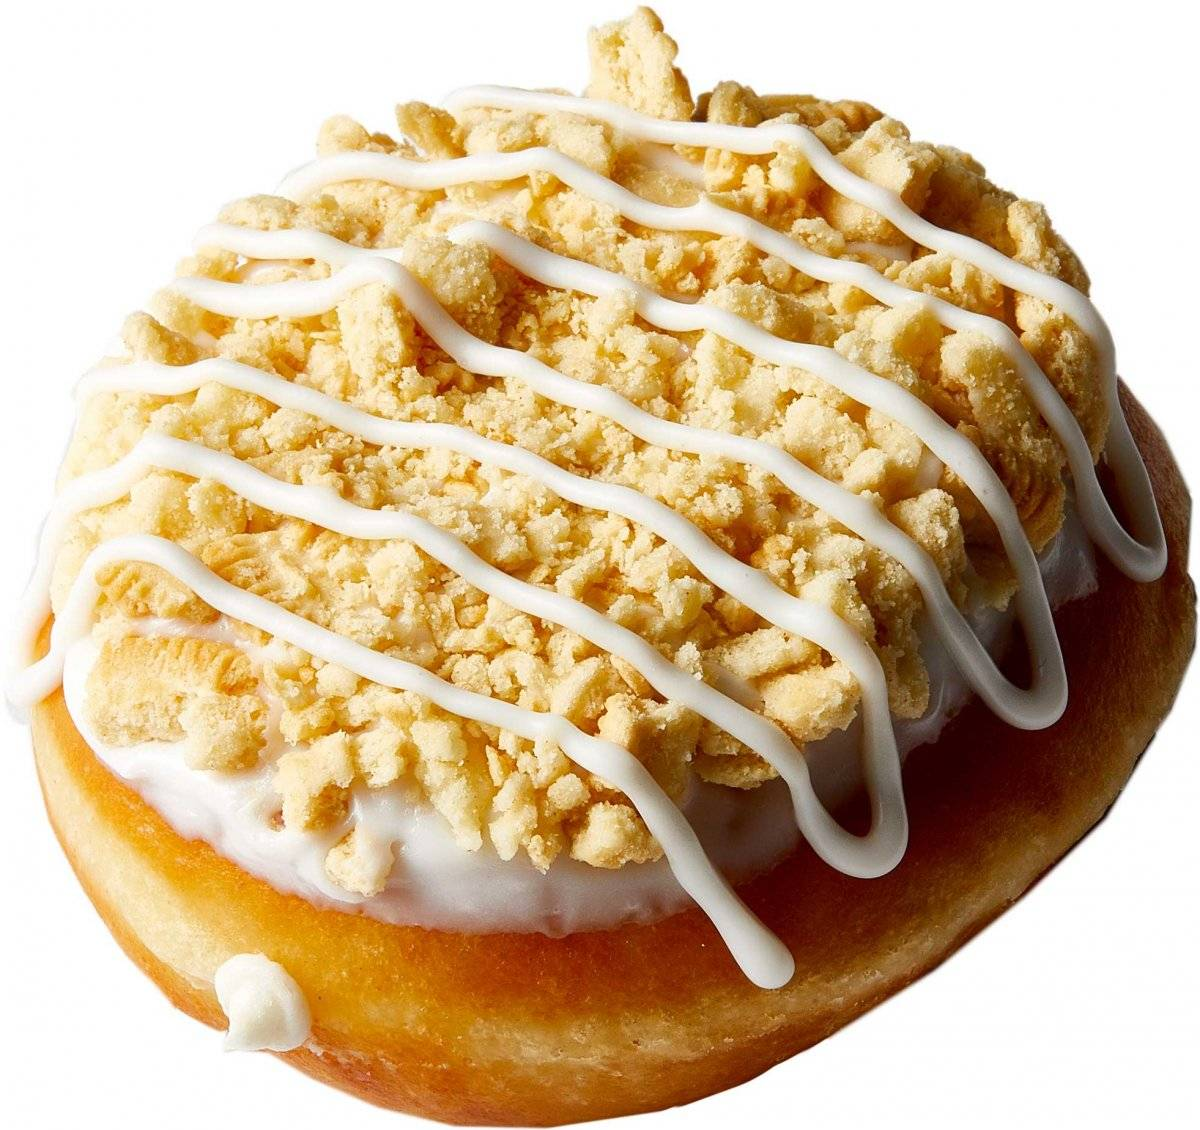 Postre.¡Krispy Kreme